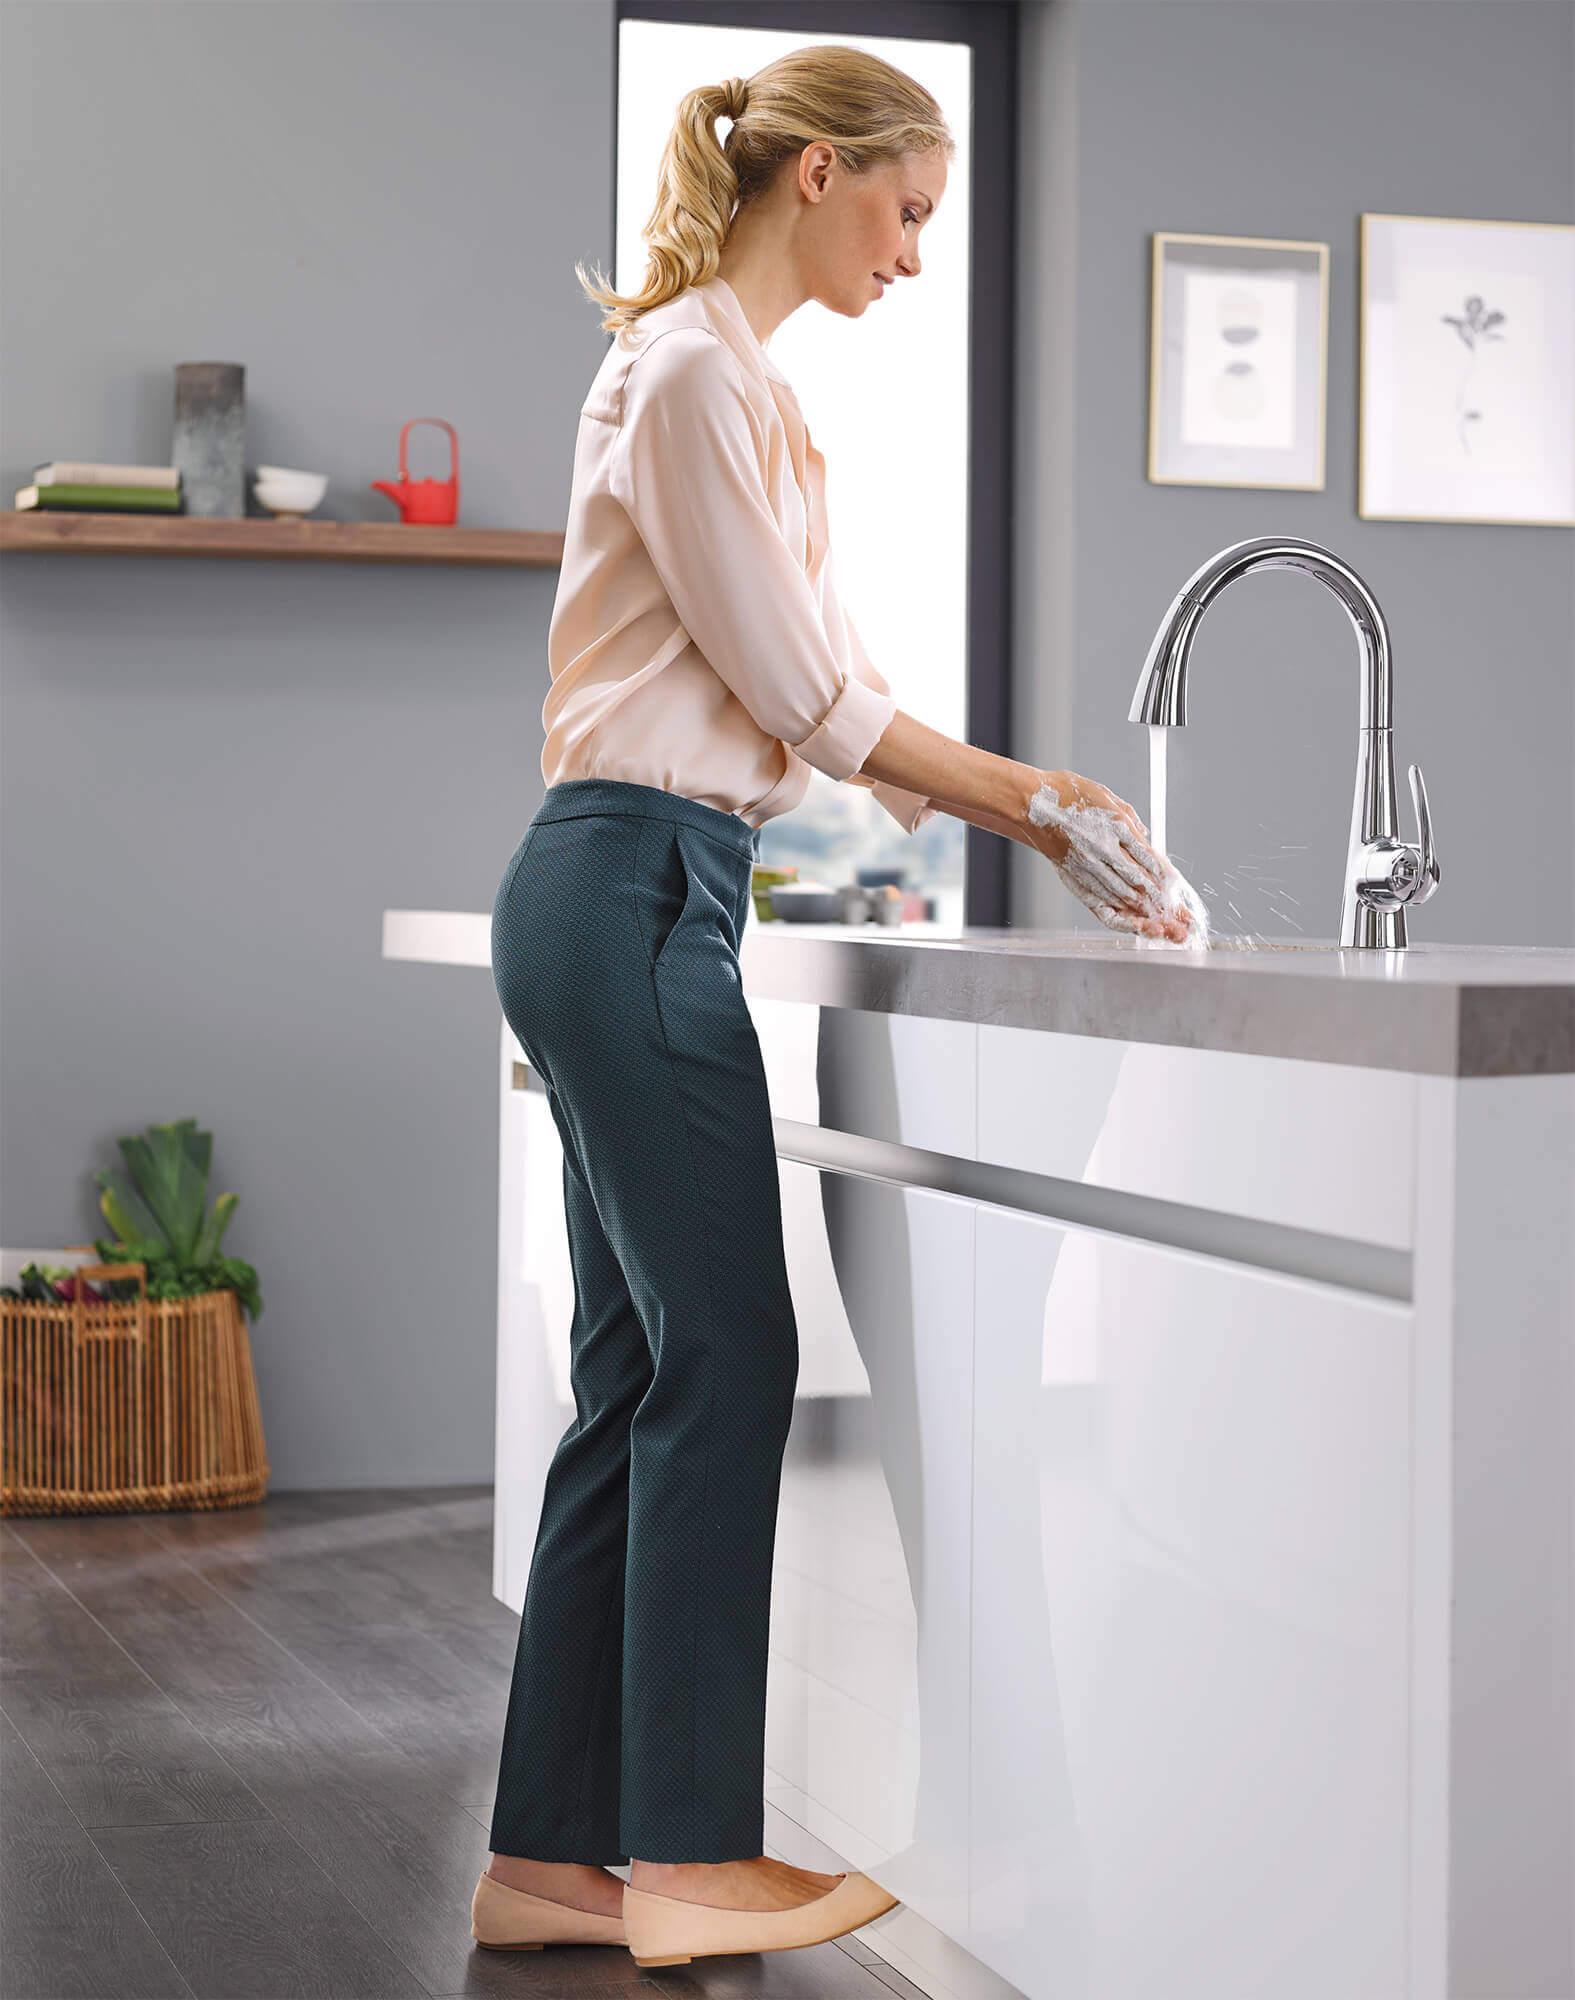 Foot Control Kitchen Faucet